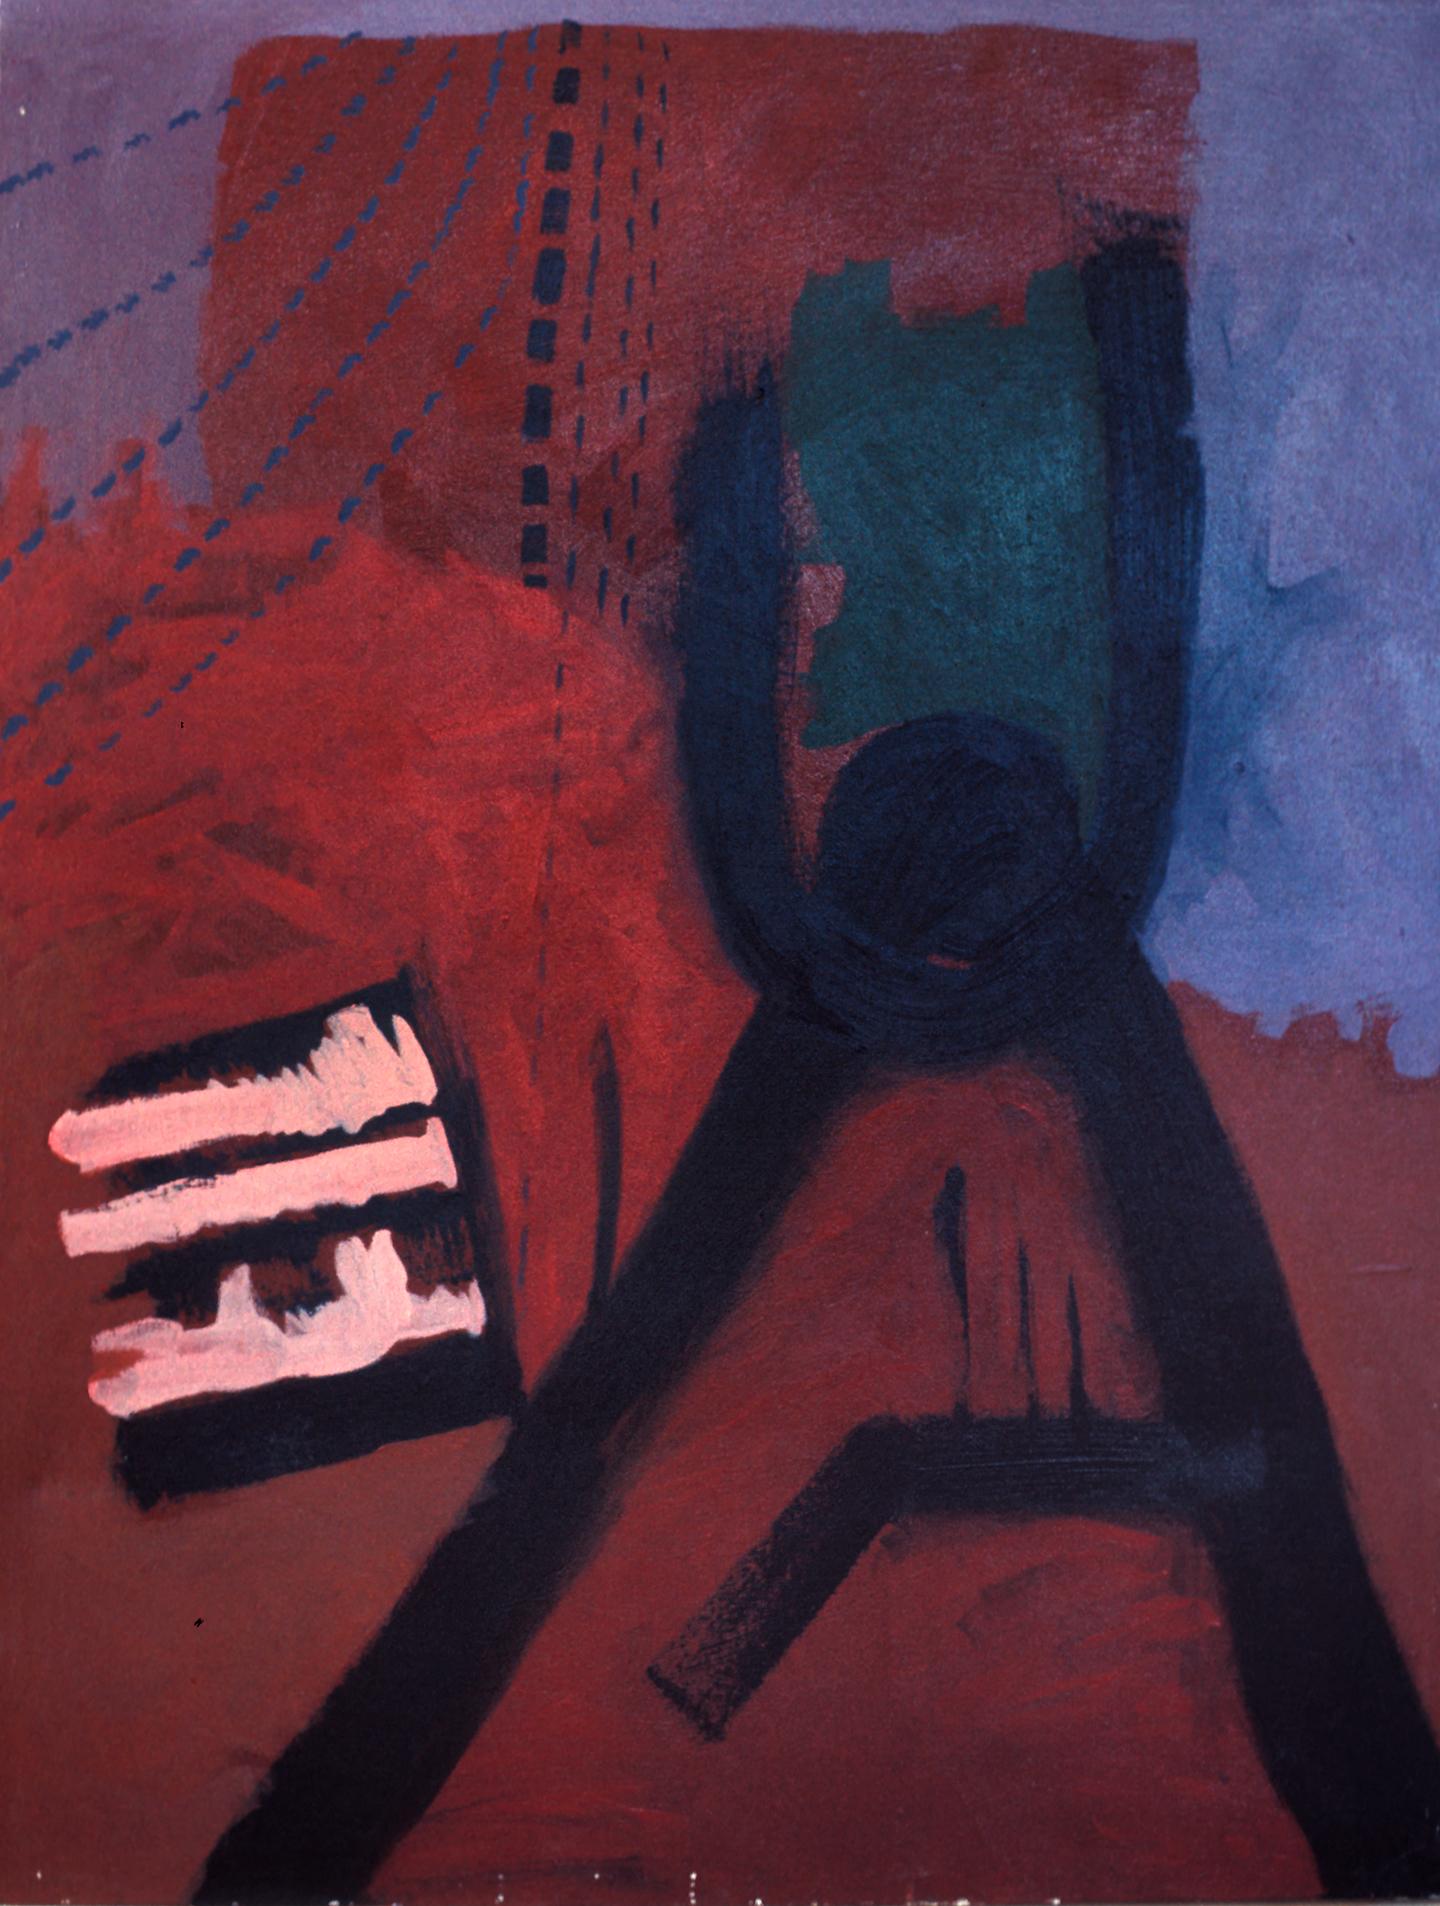 Untitled, 1968, acrylic on canvas